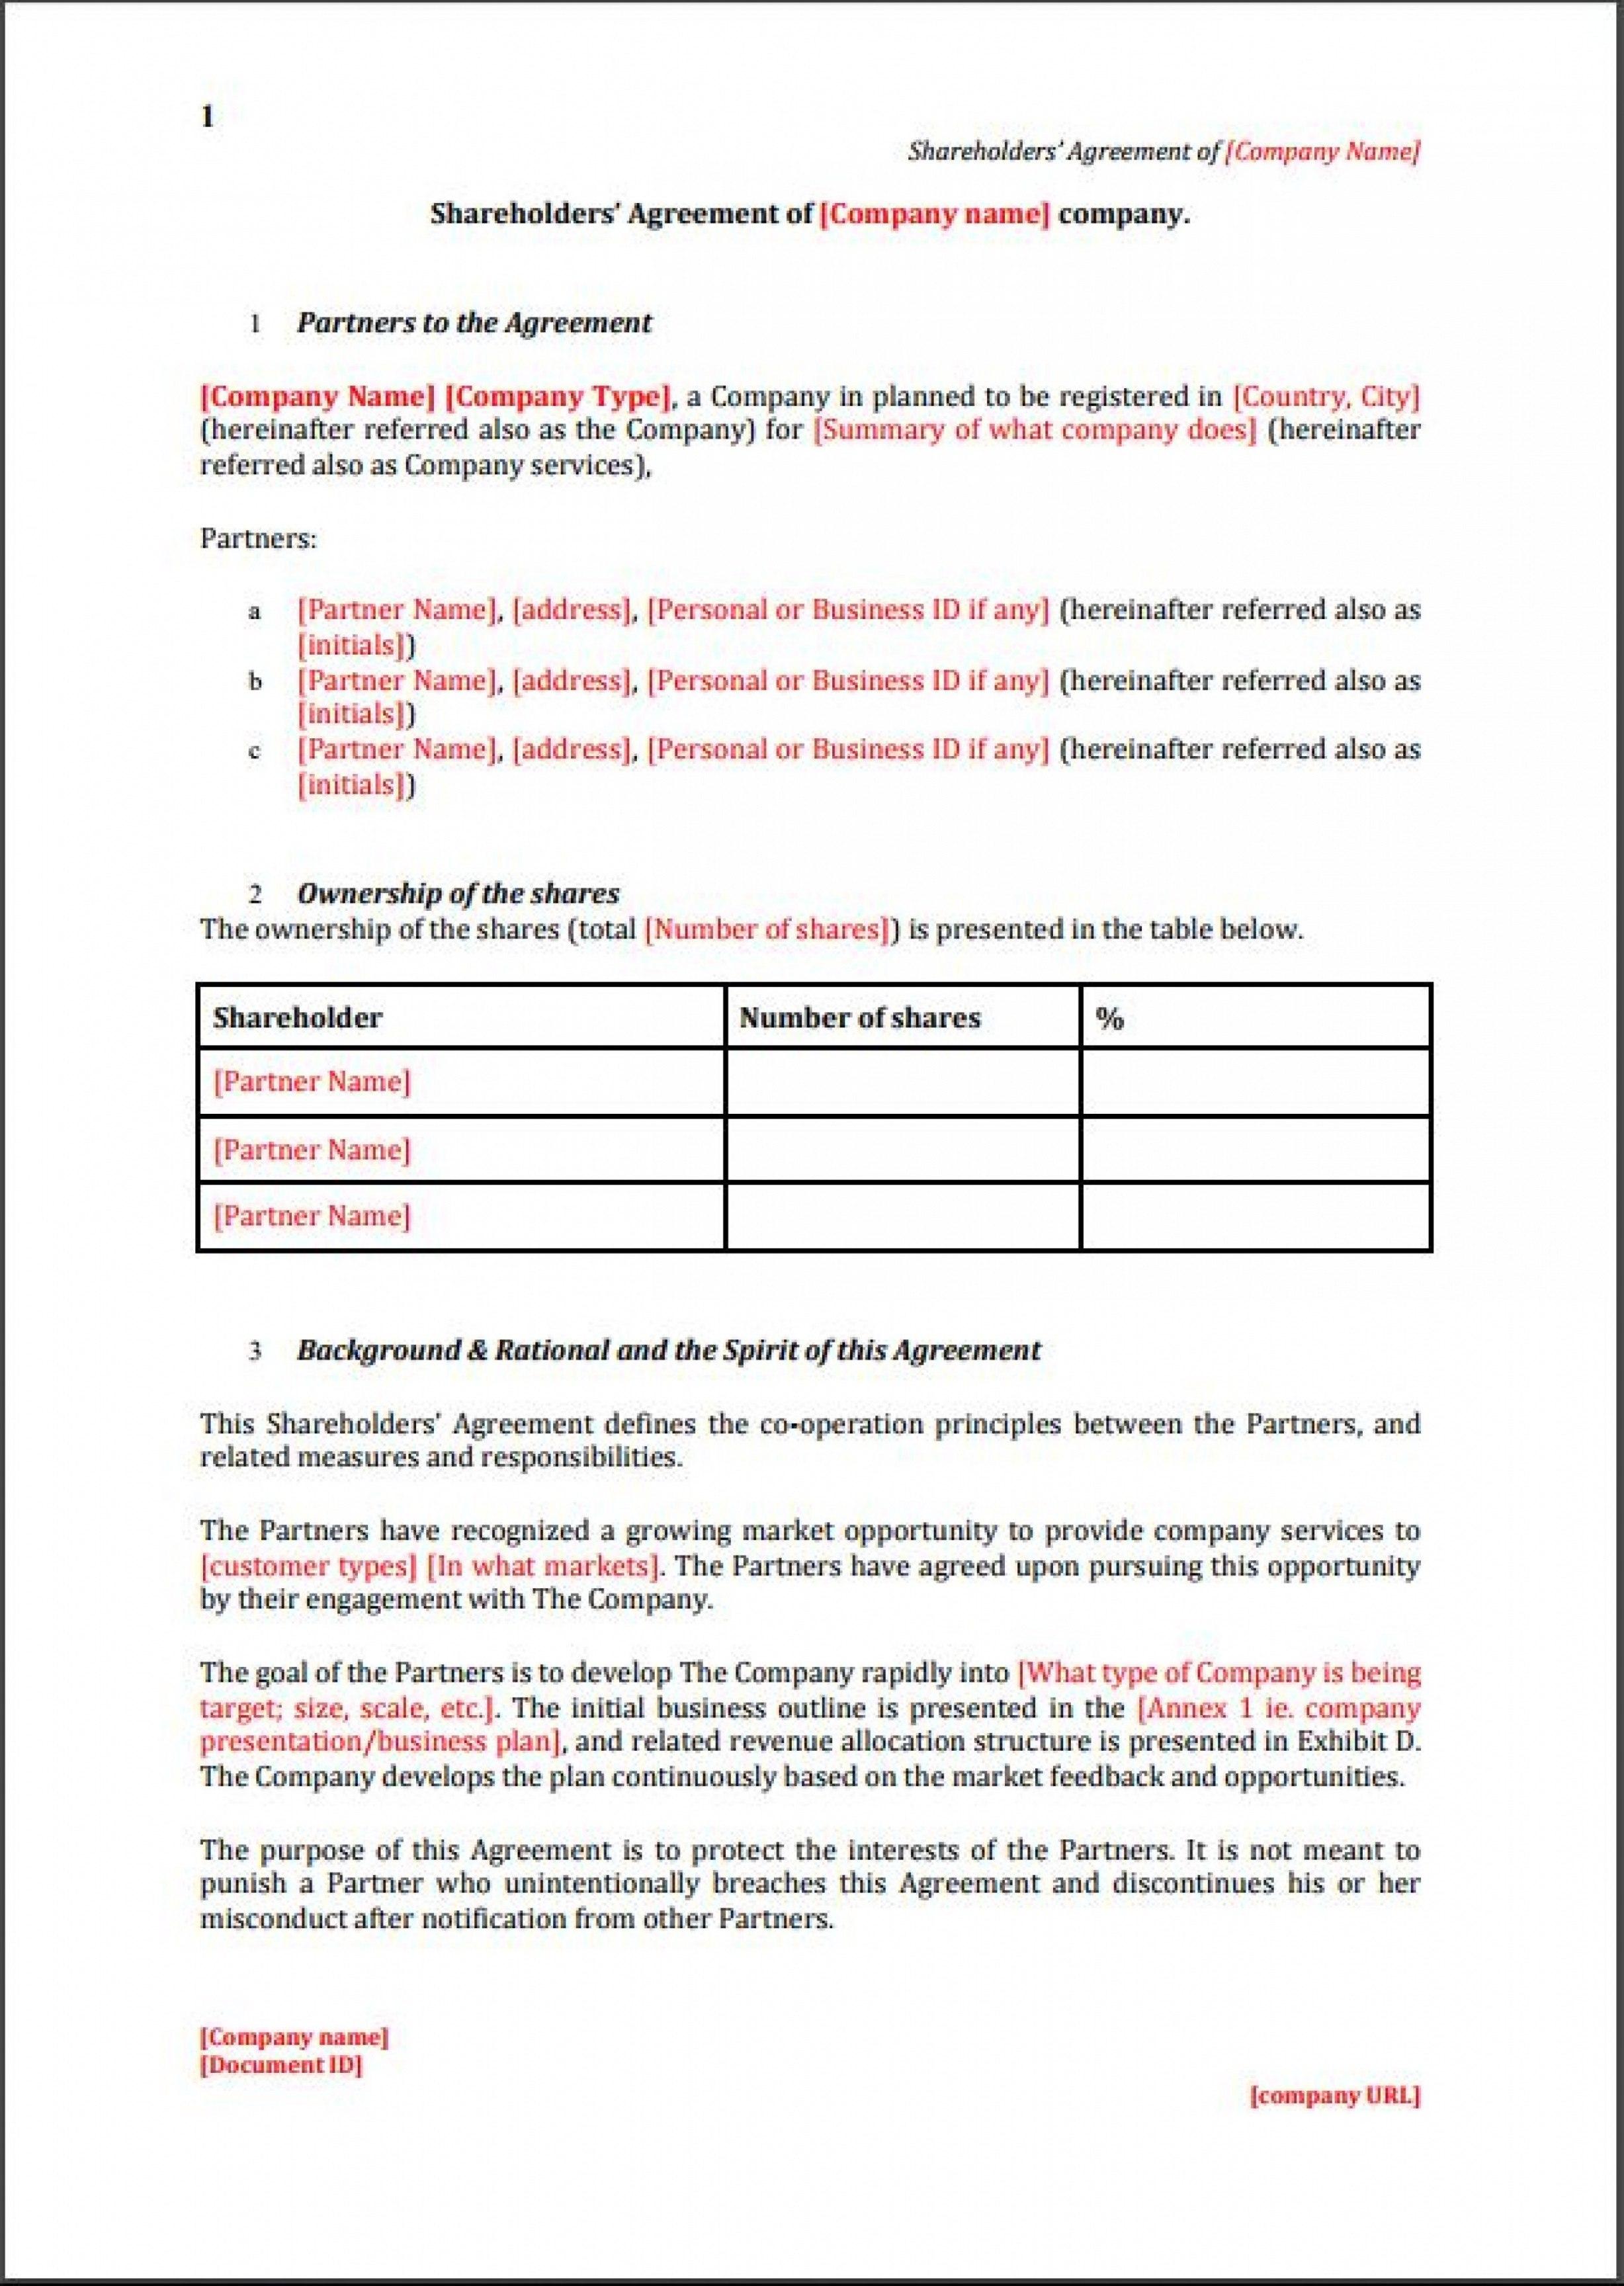 Editable Founders Shareholder Agreement Template Eloquens Startup Within Founders Shareholder Agreement Template